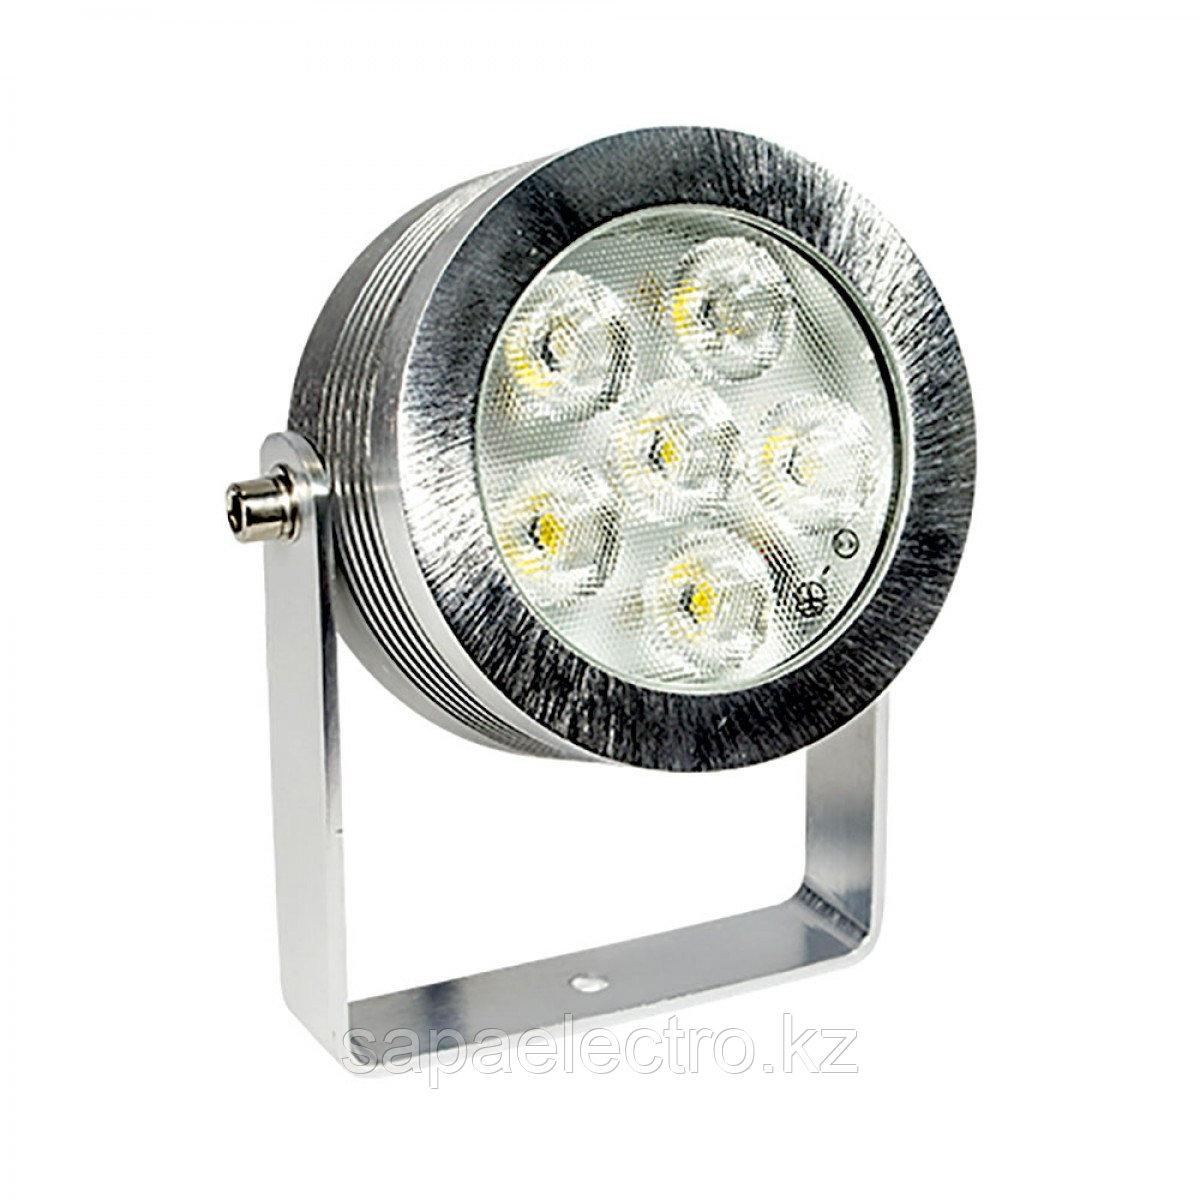 Парк. св-к  R7300L-SPIKE LED 6X1W 4000K (TS)8шт